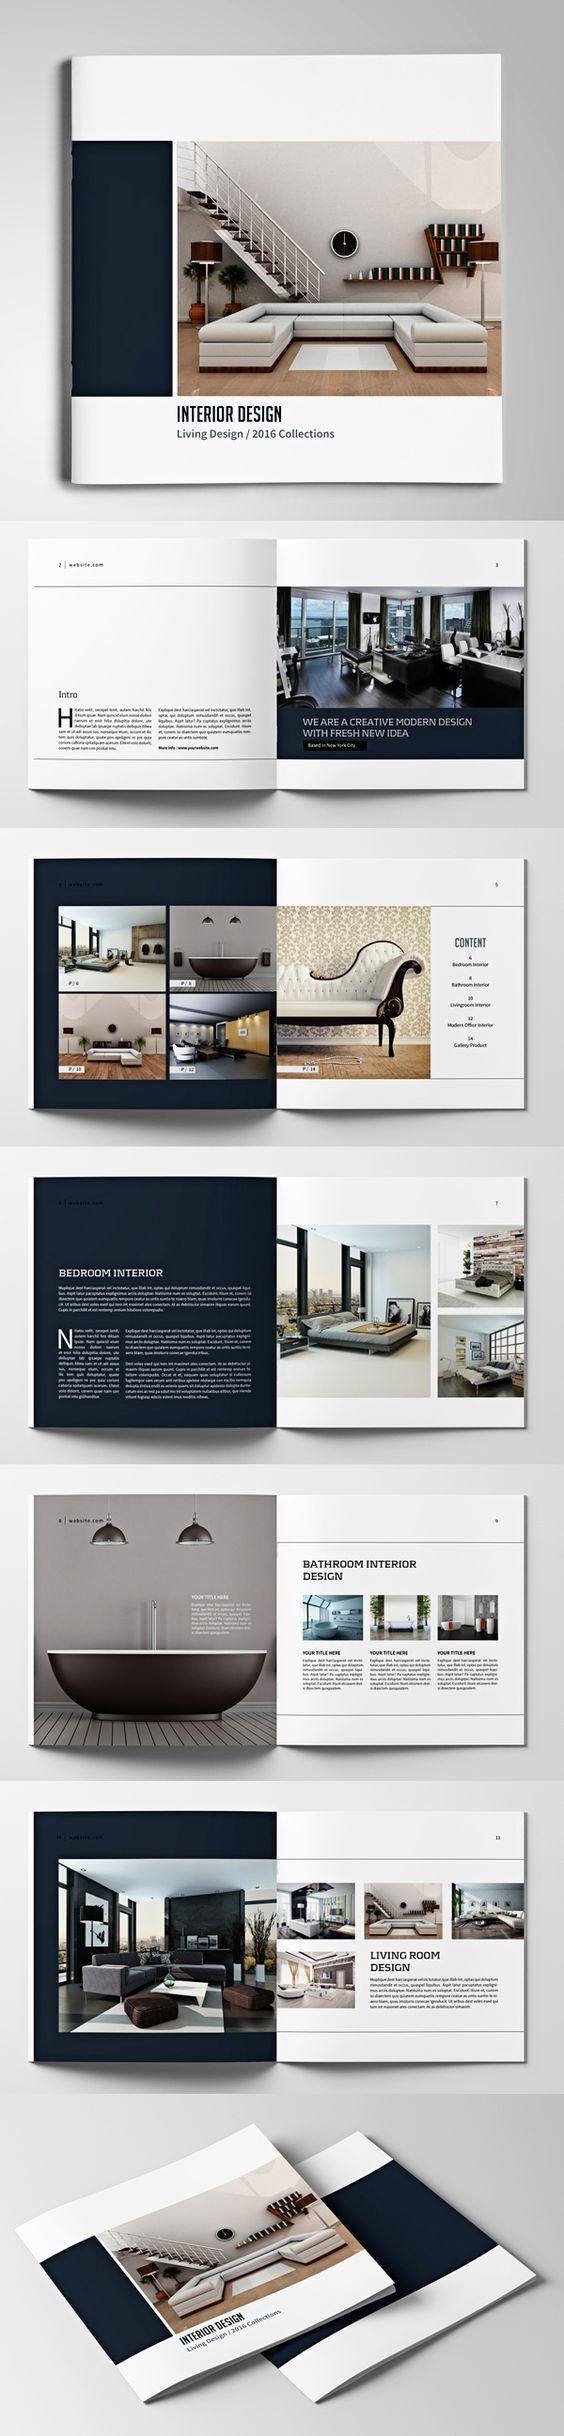 imagenes folletos 2